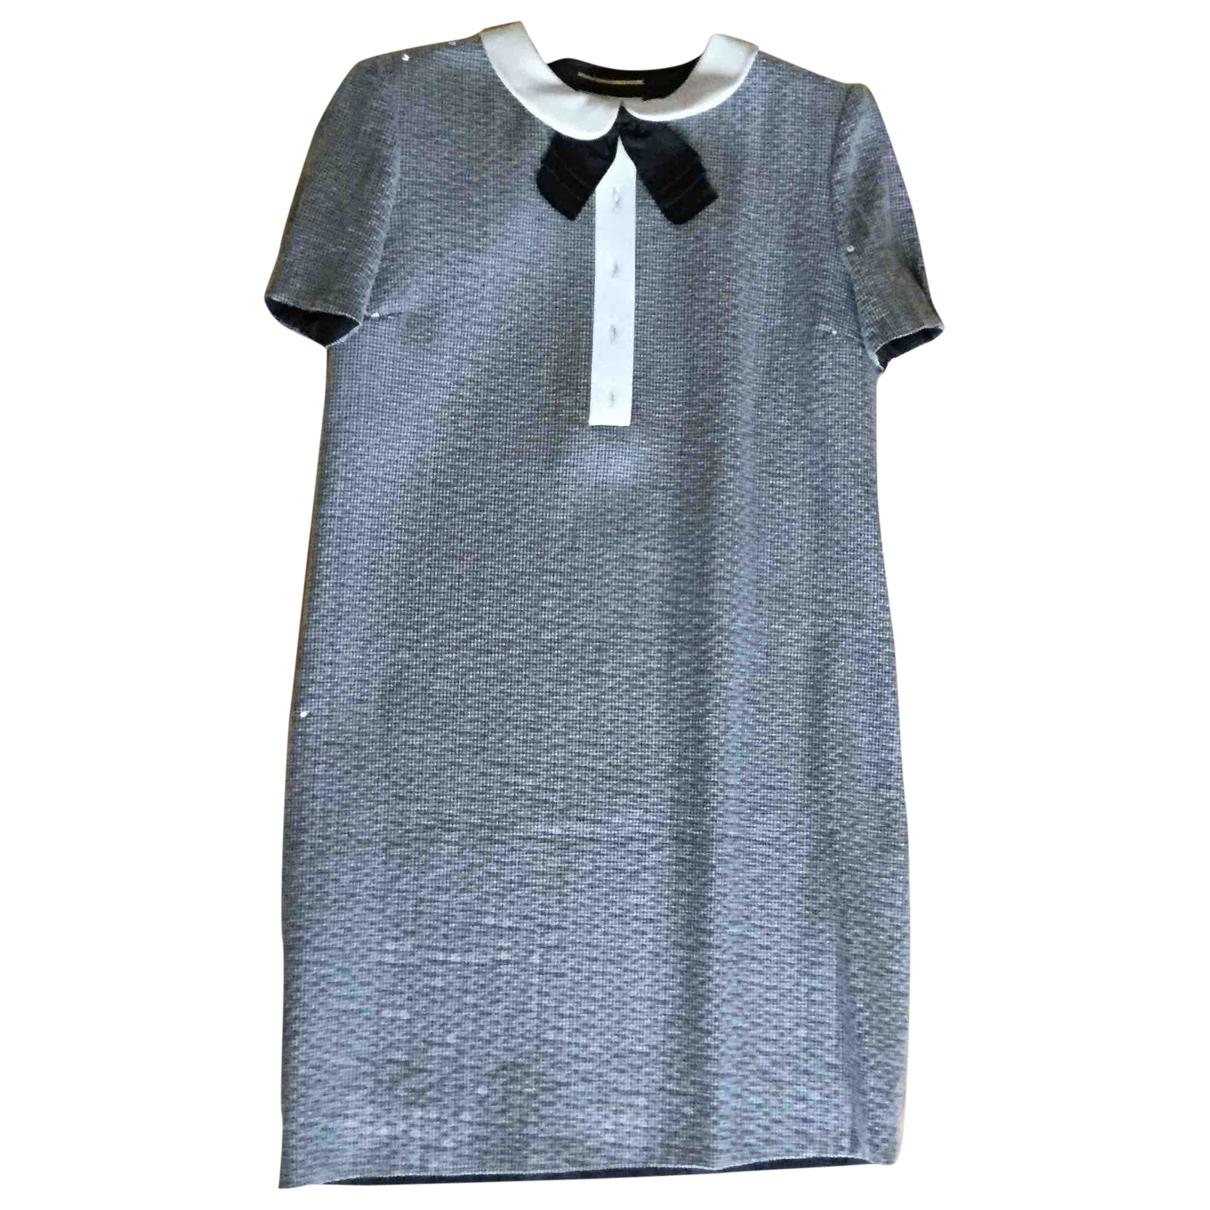 Saint Laurent \N Anthracite Wool dress for Women 36 FR